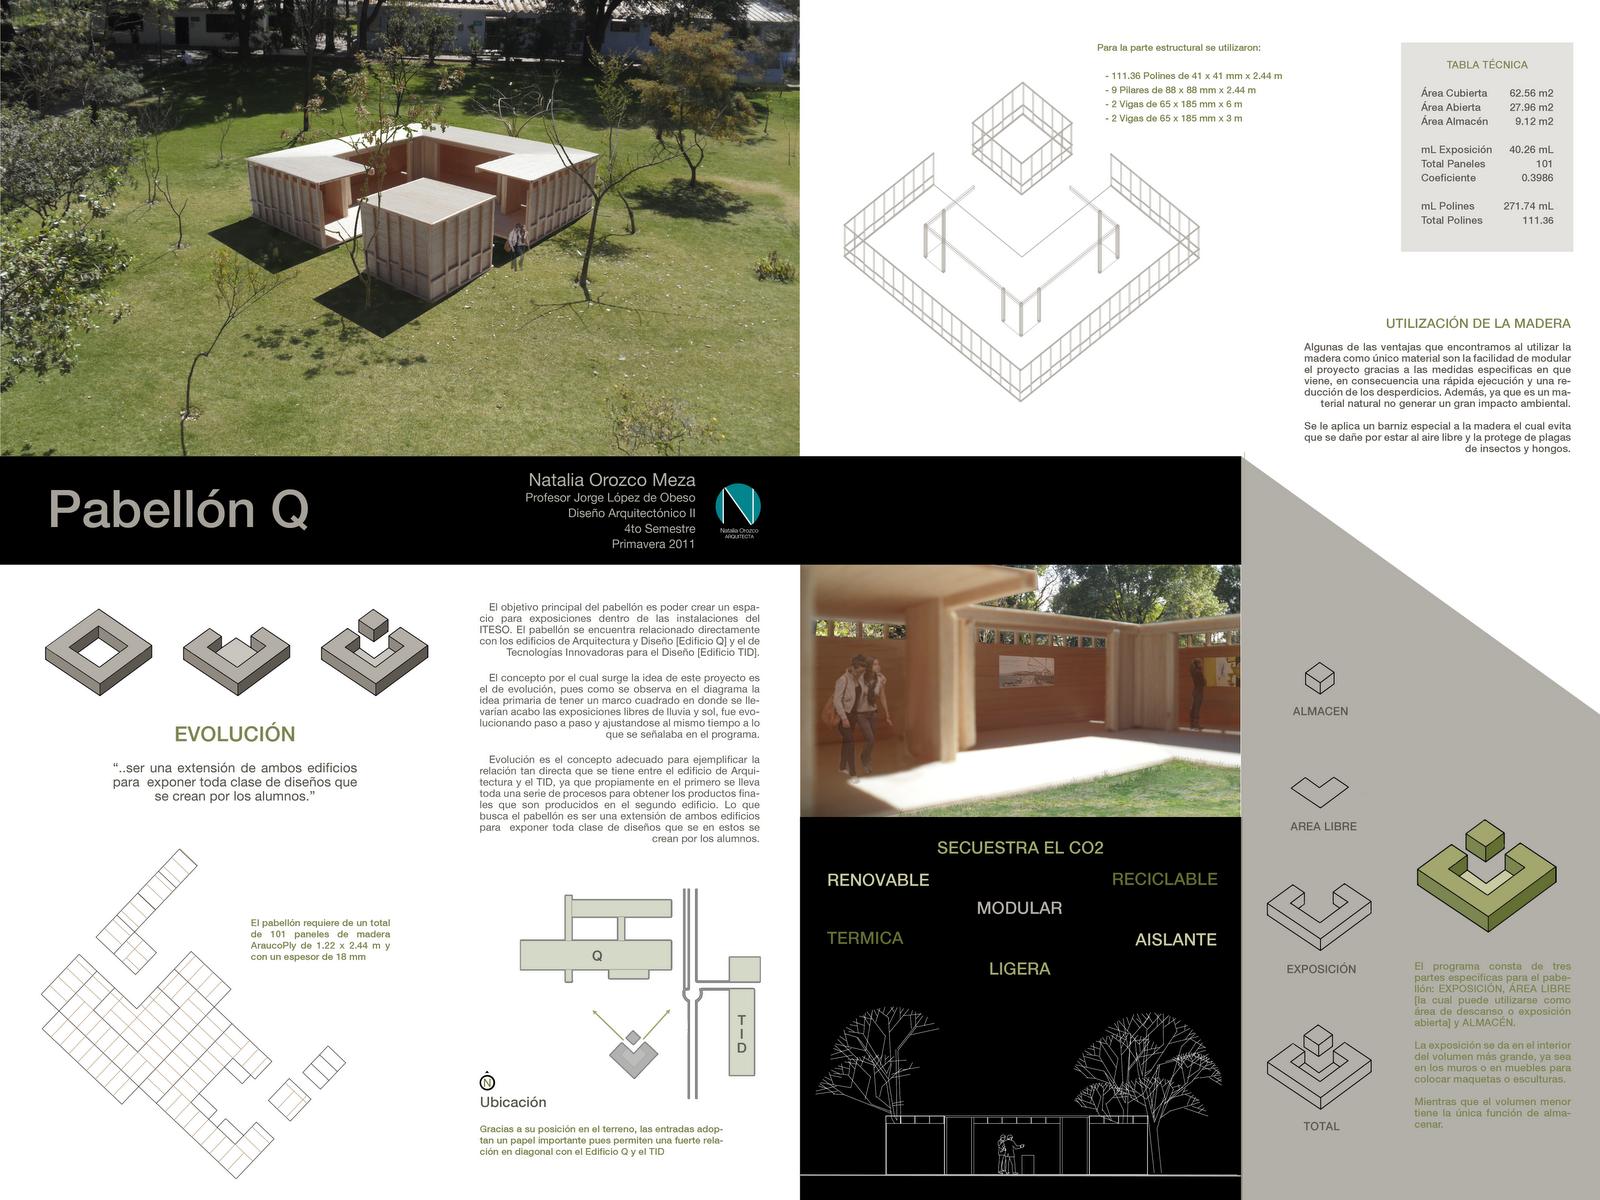 Dise o arquitect nico ii primavera 2011 iteso pabell n q for El concepto de arquitectura